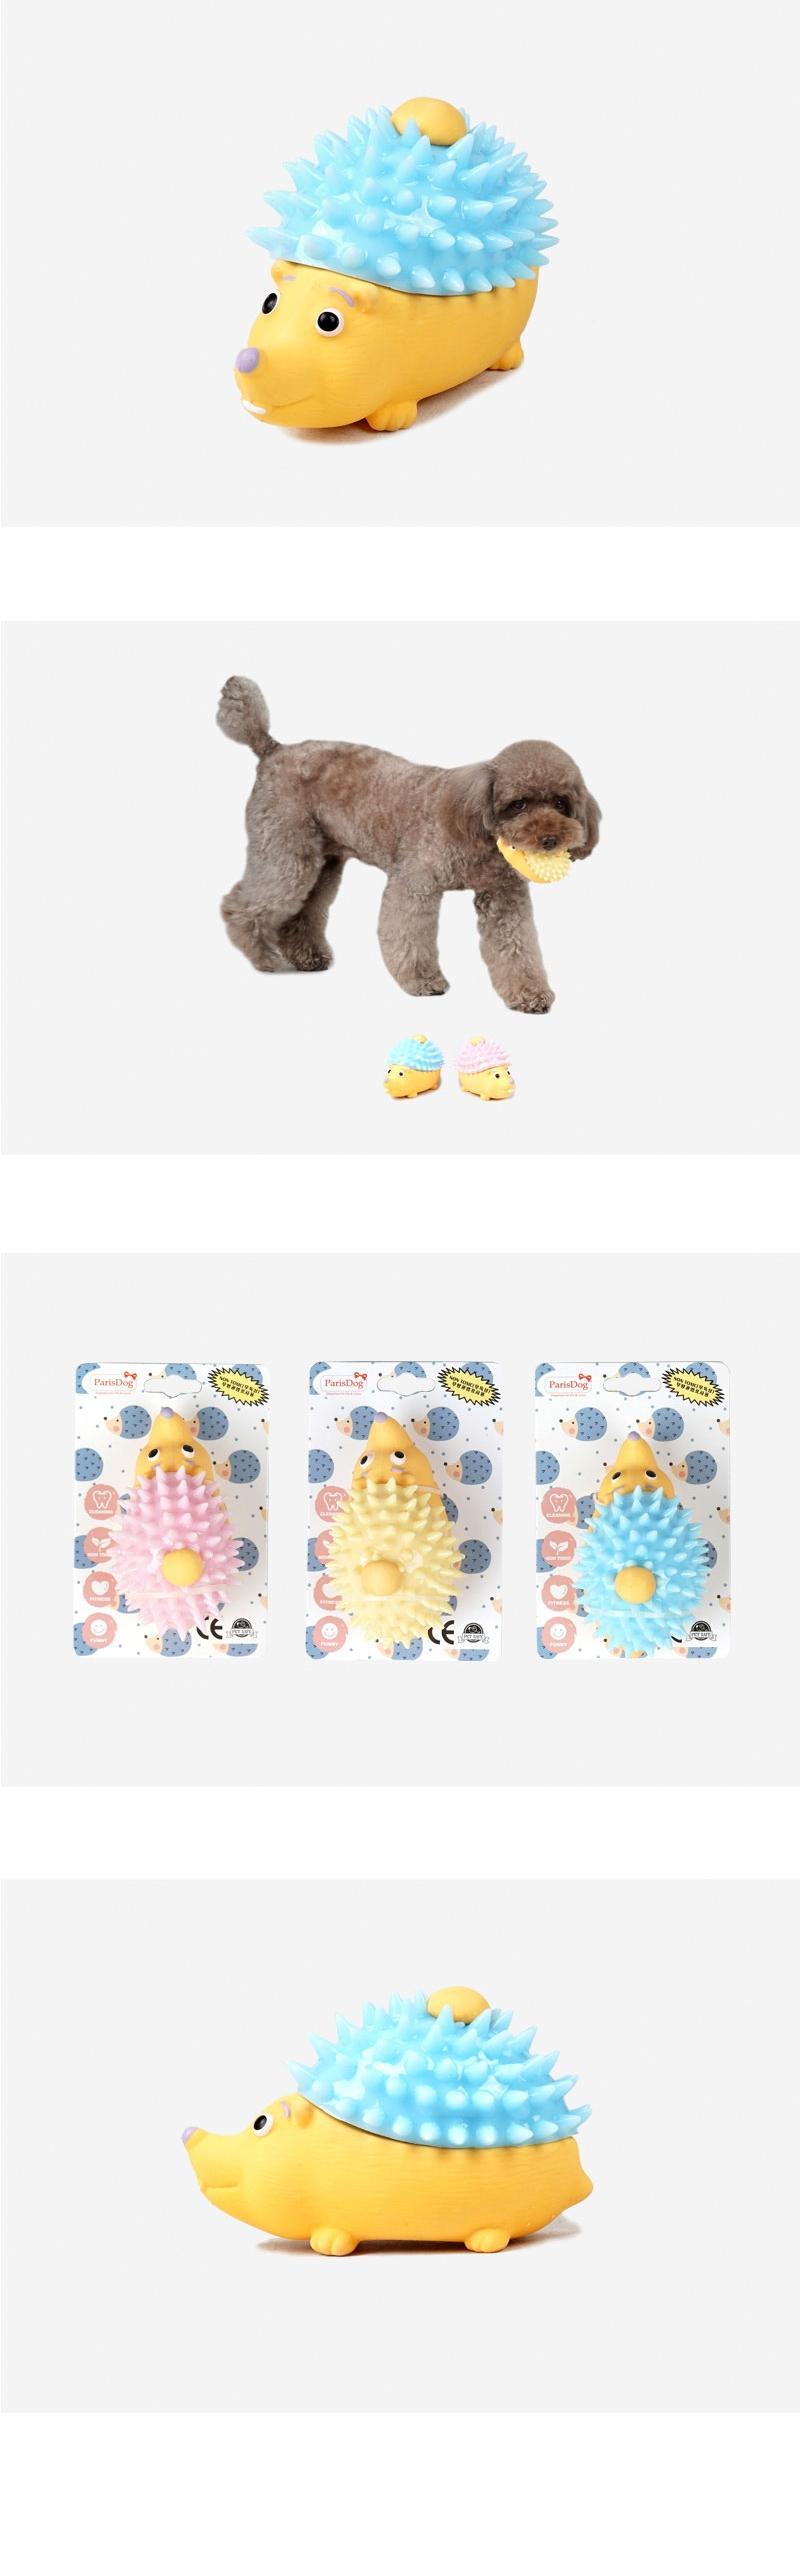 (TPR0206) 패리스독 고슴도치 TPR 라텍스 토이 (1box- 애견삑삑이 강아지놀이감 강아지장난감 소리나는장난감 반려동물장난감